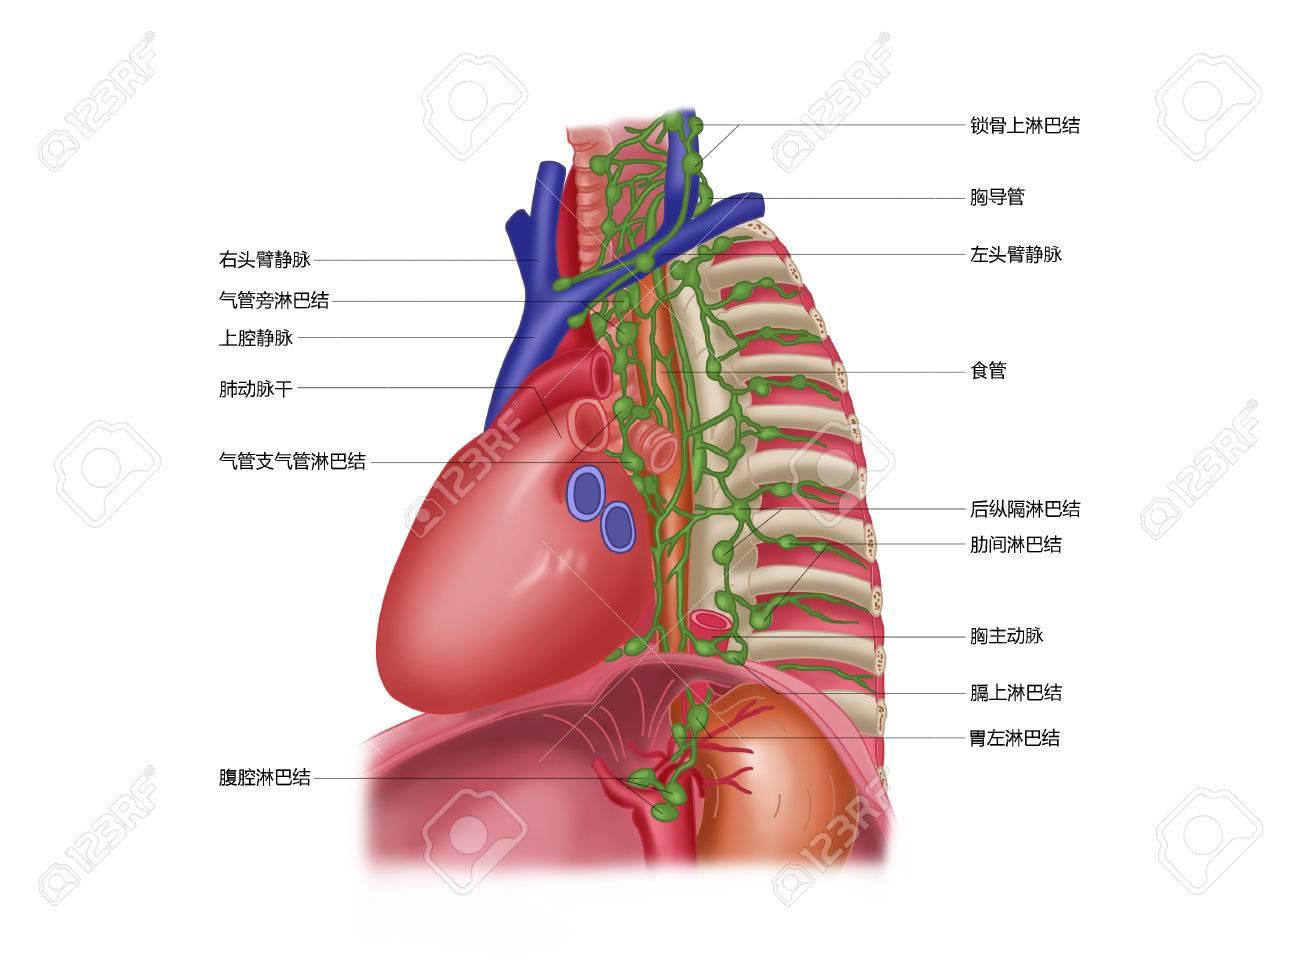 Diagram Of Mediastinal Lymph Nodes Library Of Wiring Diagram